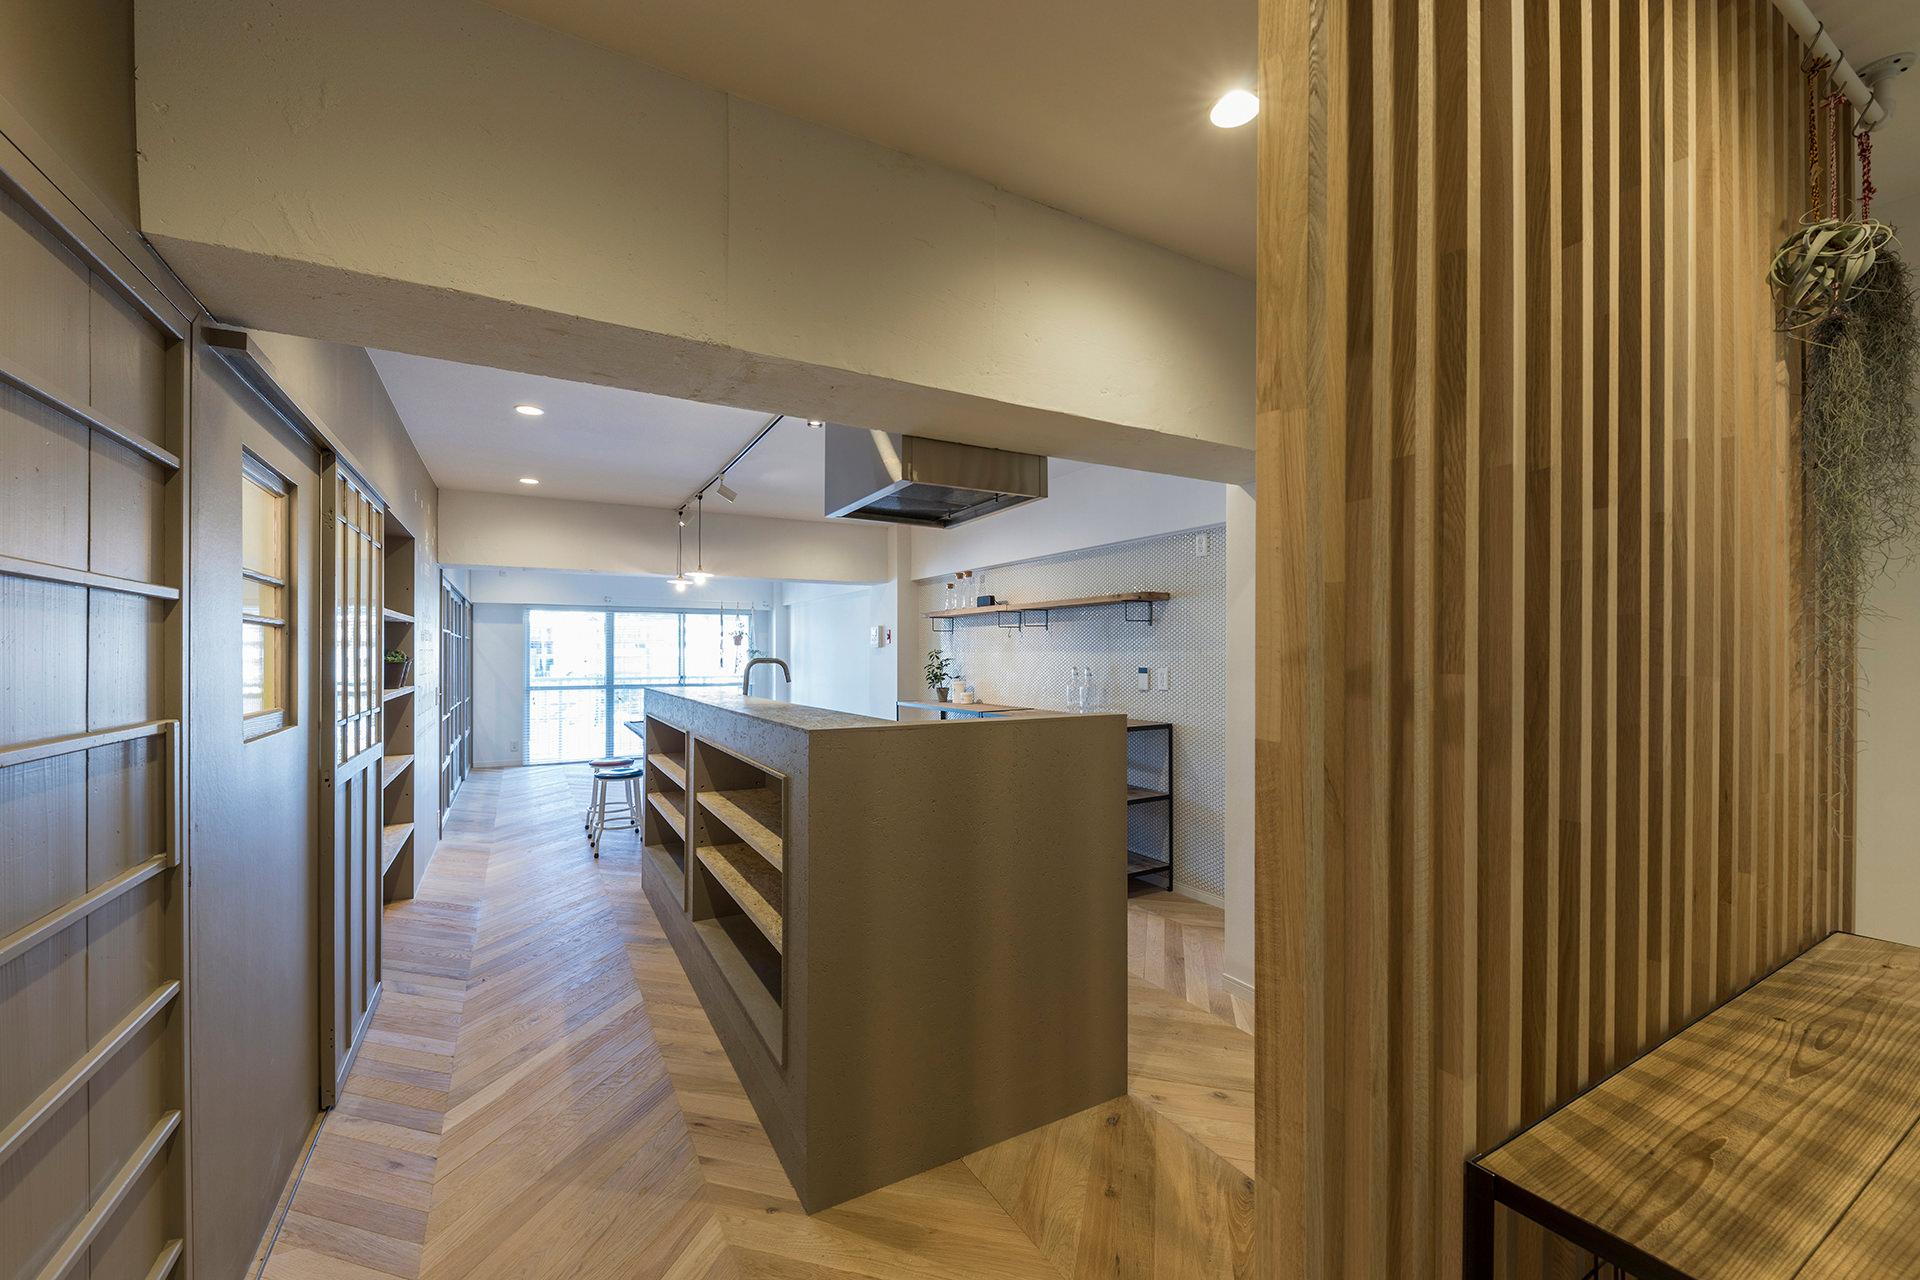 stri-ep house* flat 葉山エコーハイツ  イメージ3 撮影:東涌写真事務所・東涌宏和